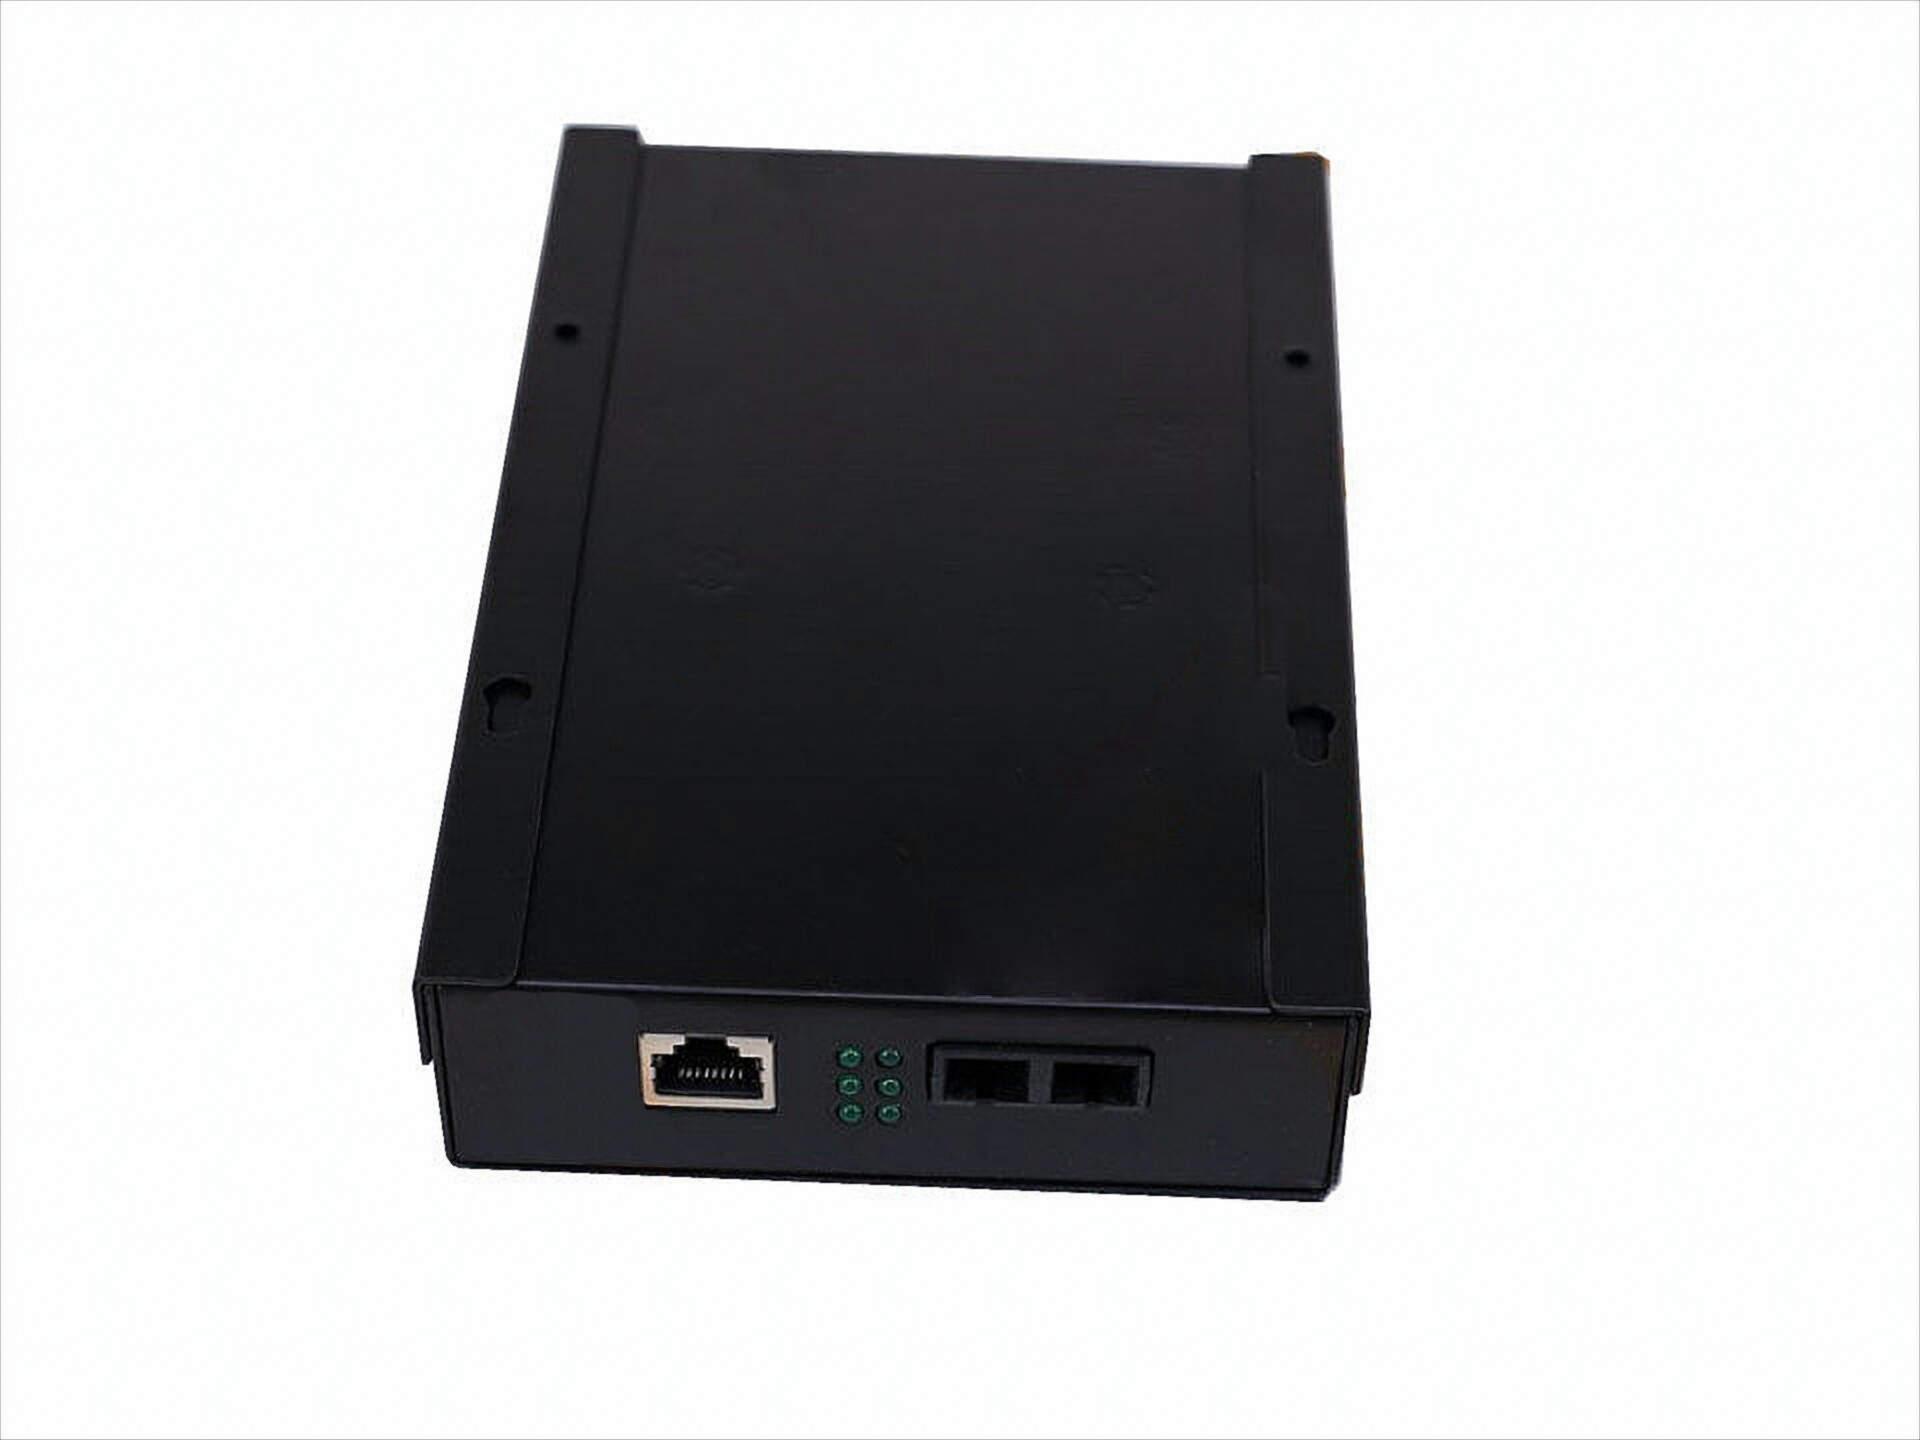 Artikelfoto 1 LINSN Multi Mode Glasfaser Konverter MC801 für Led Wall Systeme